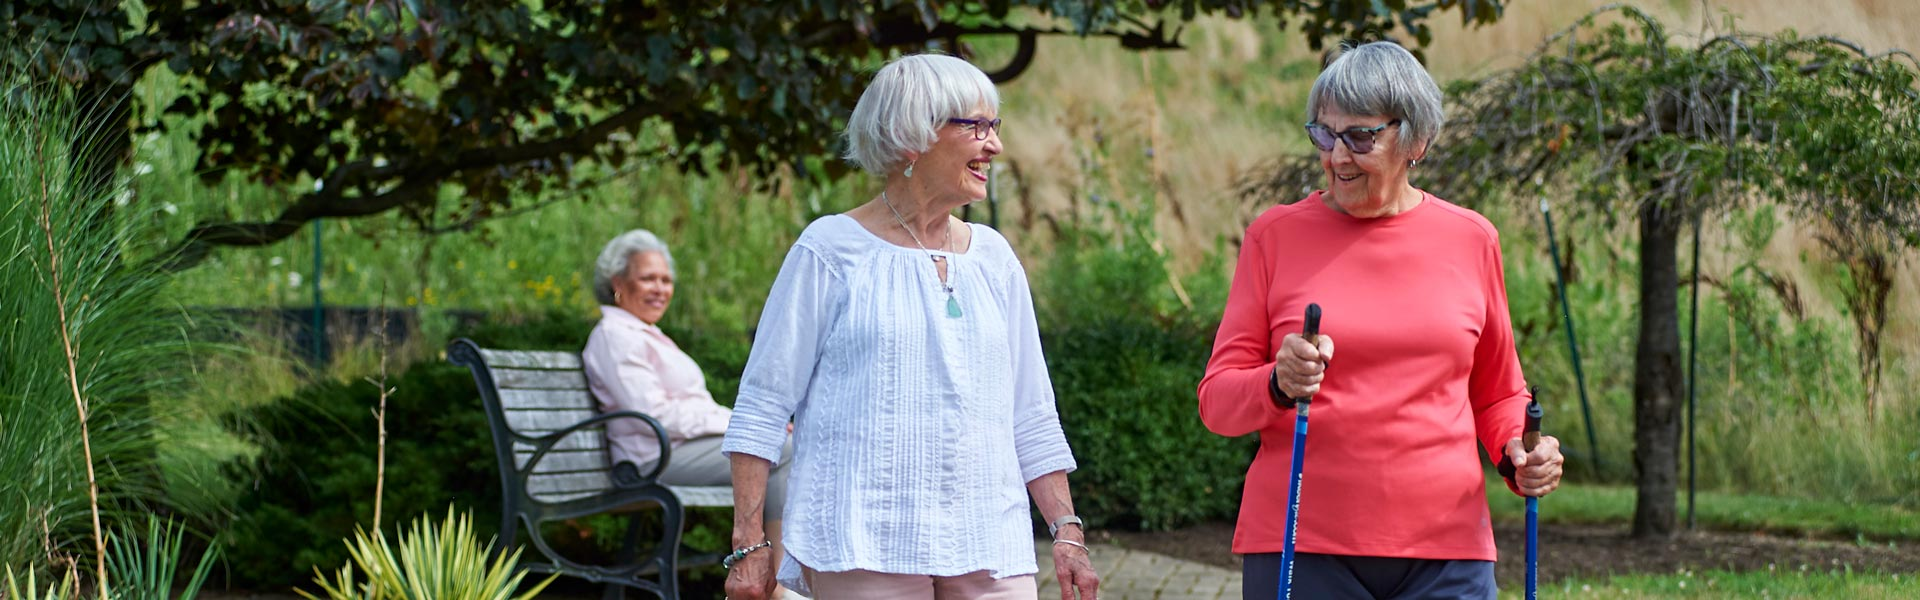 Two senior women on a walk